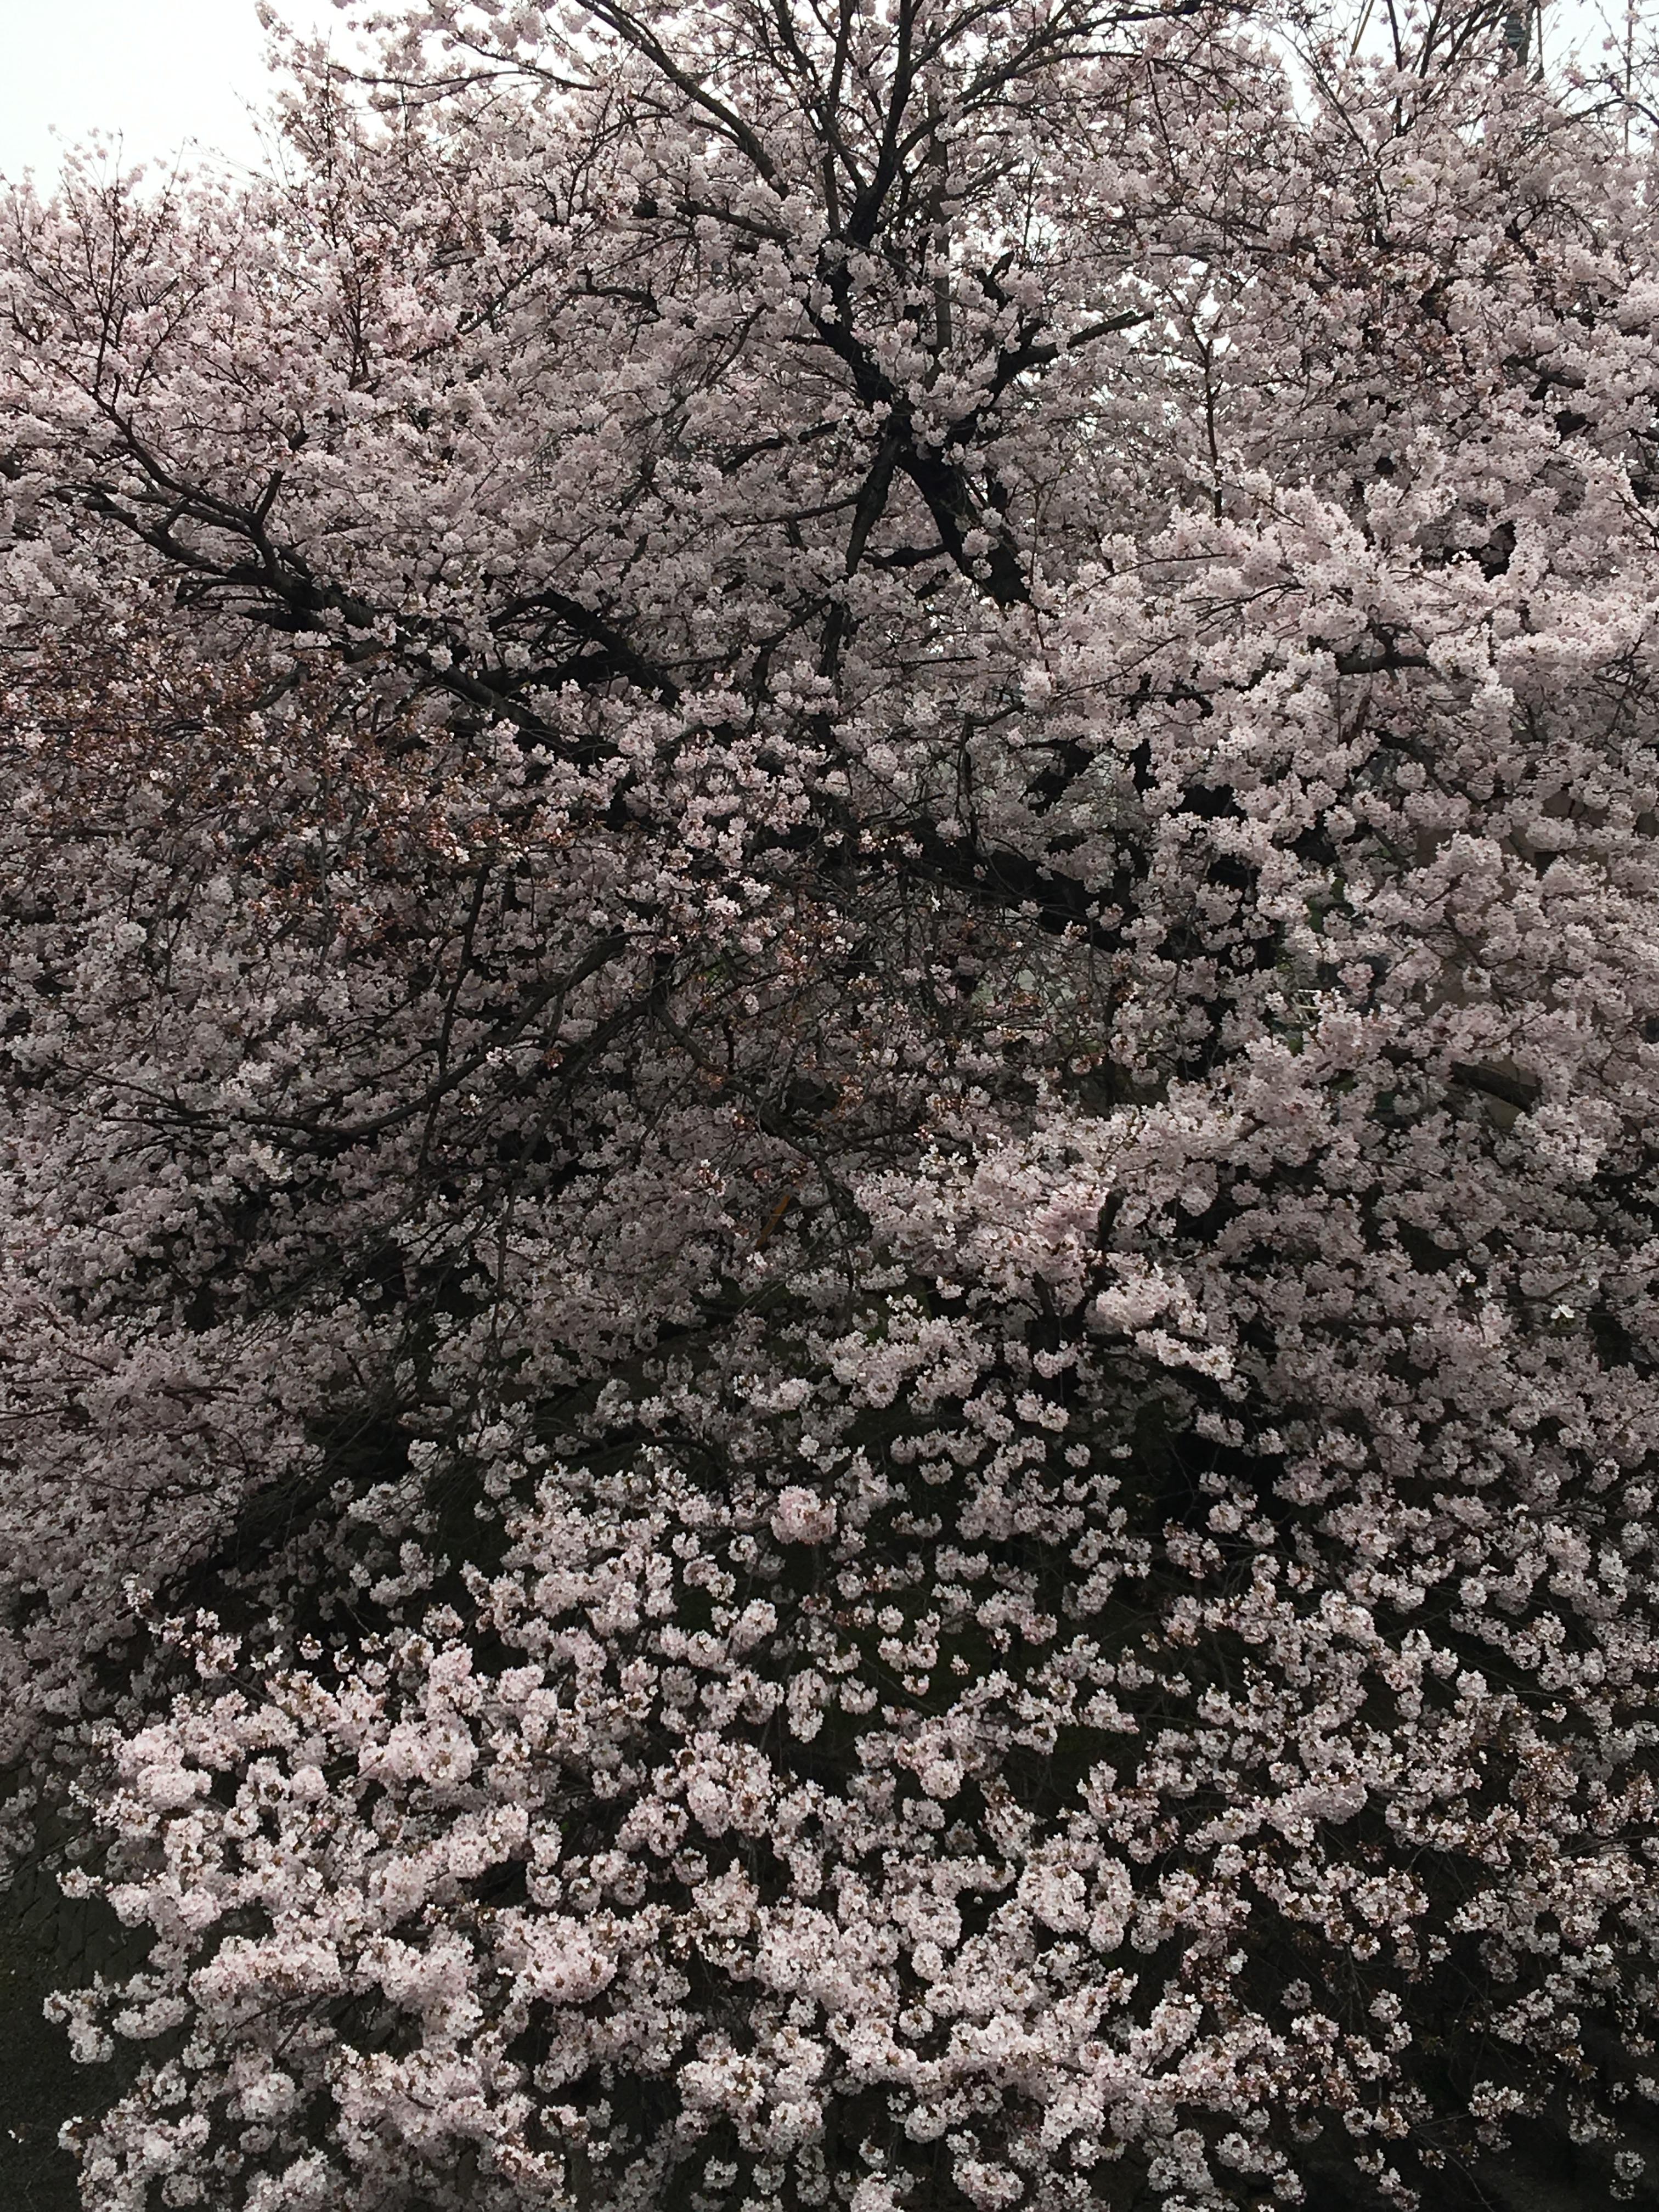 http://www.okadakomuten.com/blog1_img/2016-04-03%2015.14.58.jpg